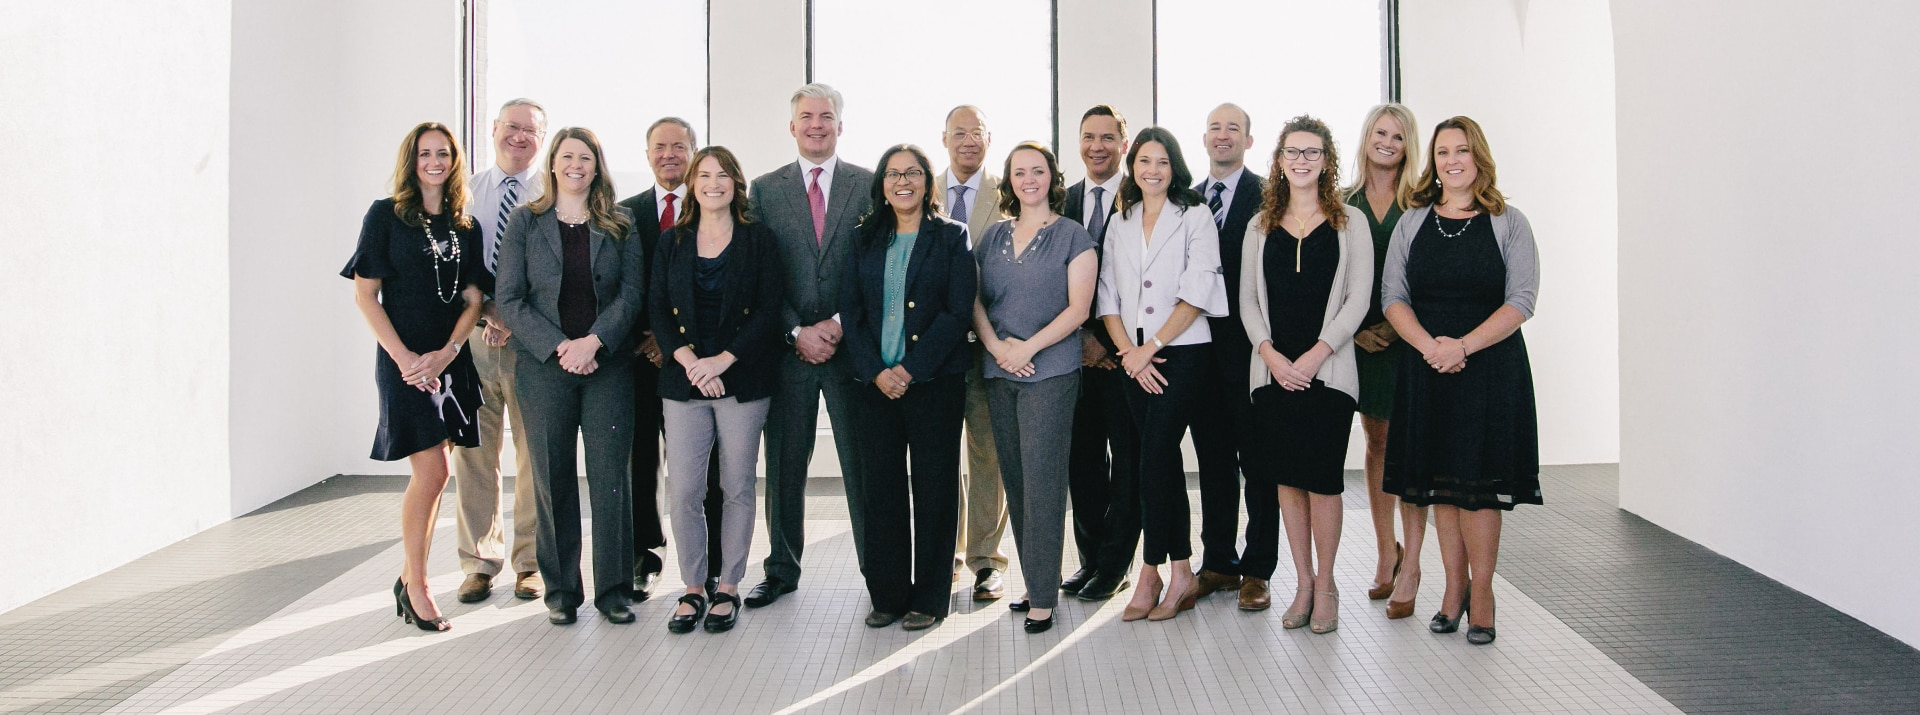 Sierra Neurosurgery Team group portrait